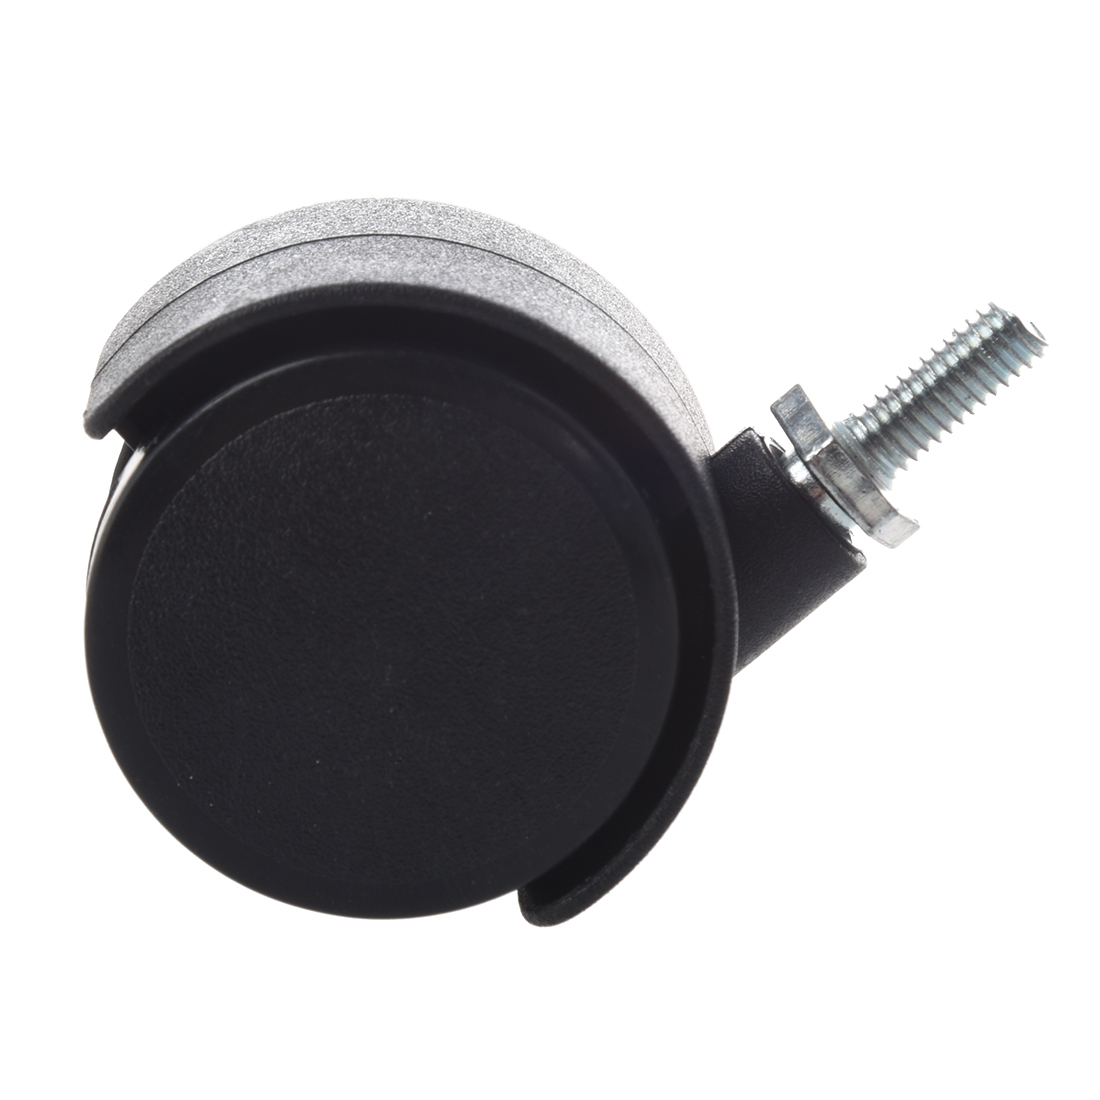 Rodízio giratório da roda dupla da haste 40mm rosqueada de 6mm preto-1